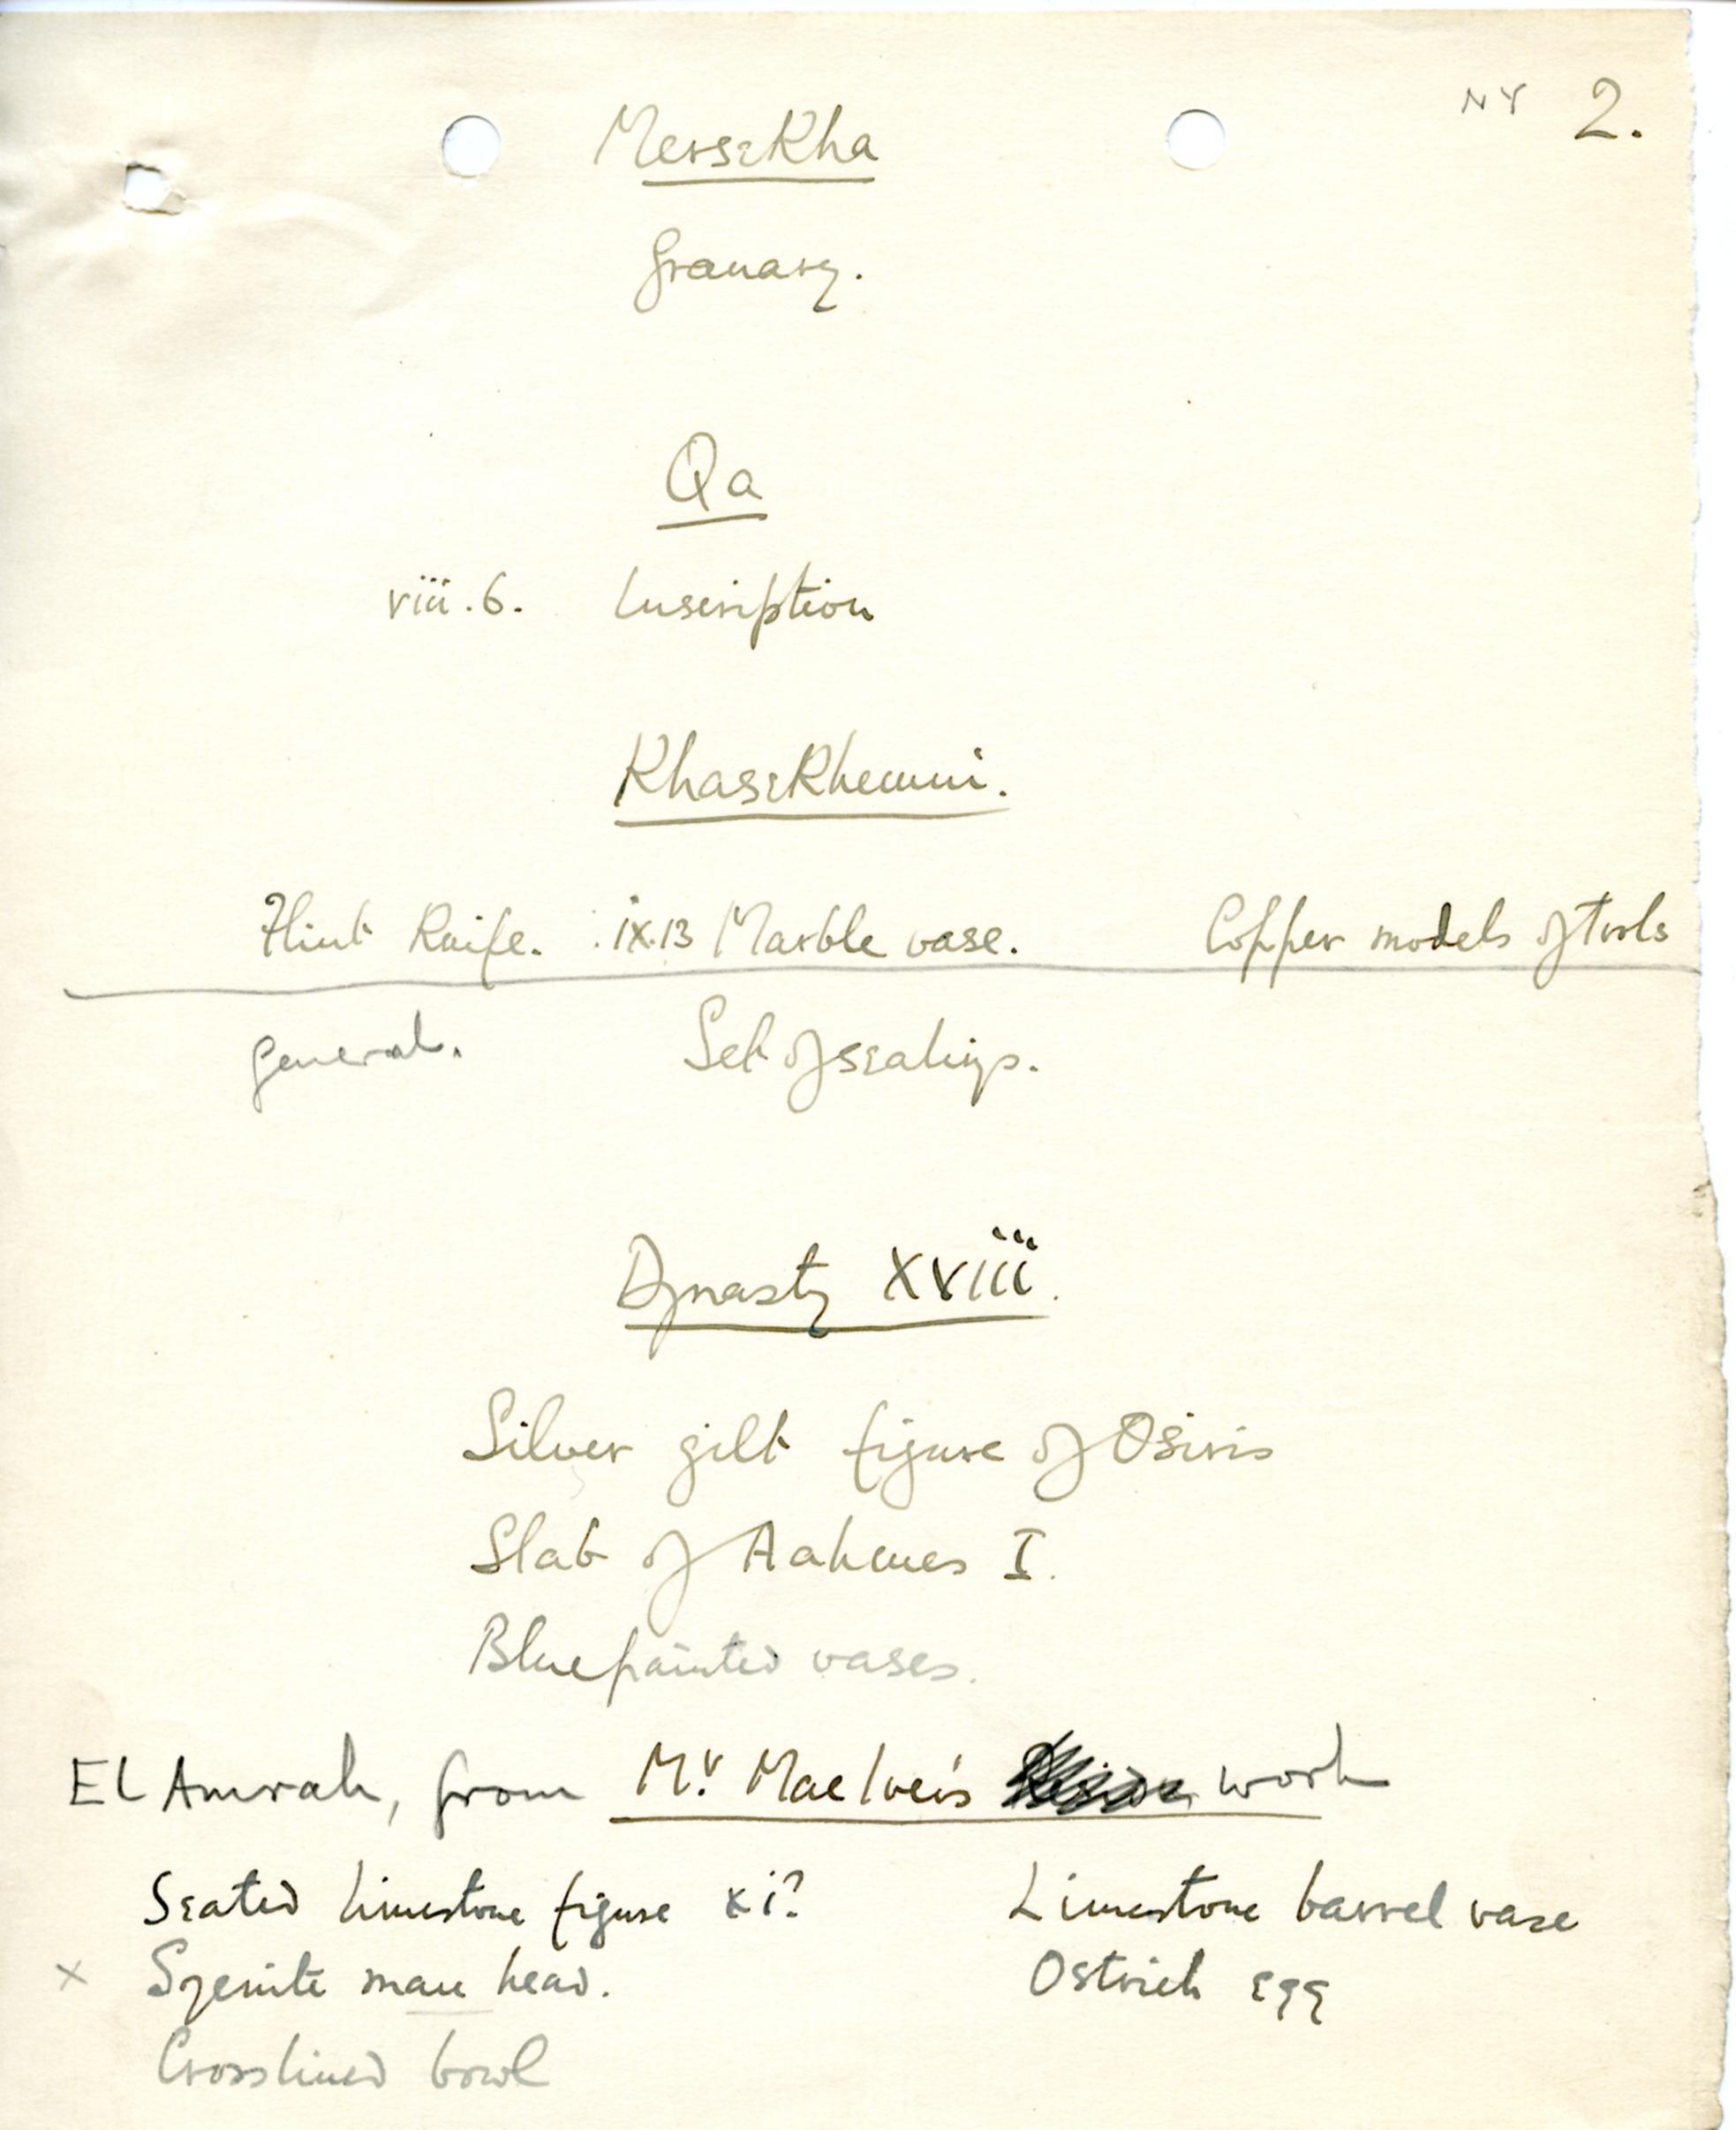 1898-1899 Hu, 1899-1900 Abydos DIST.17.76b